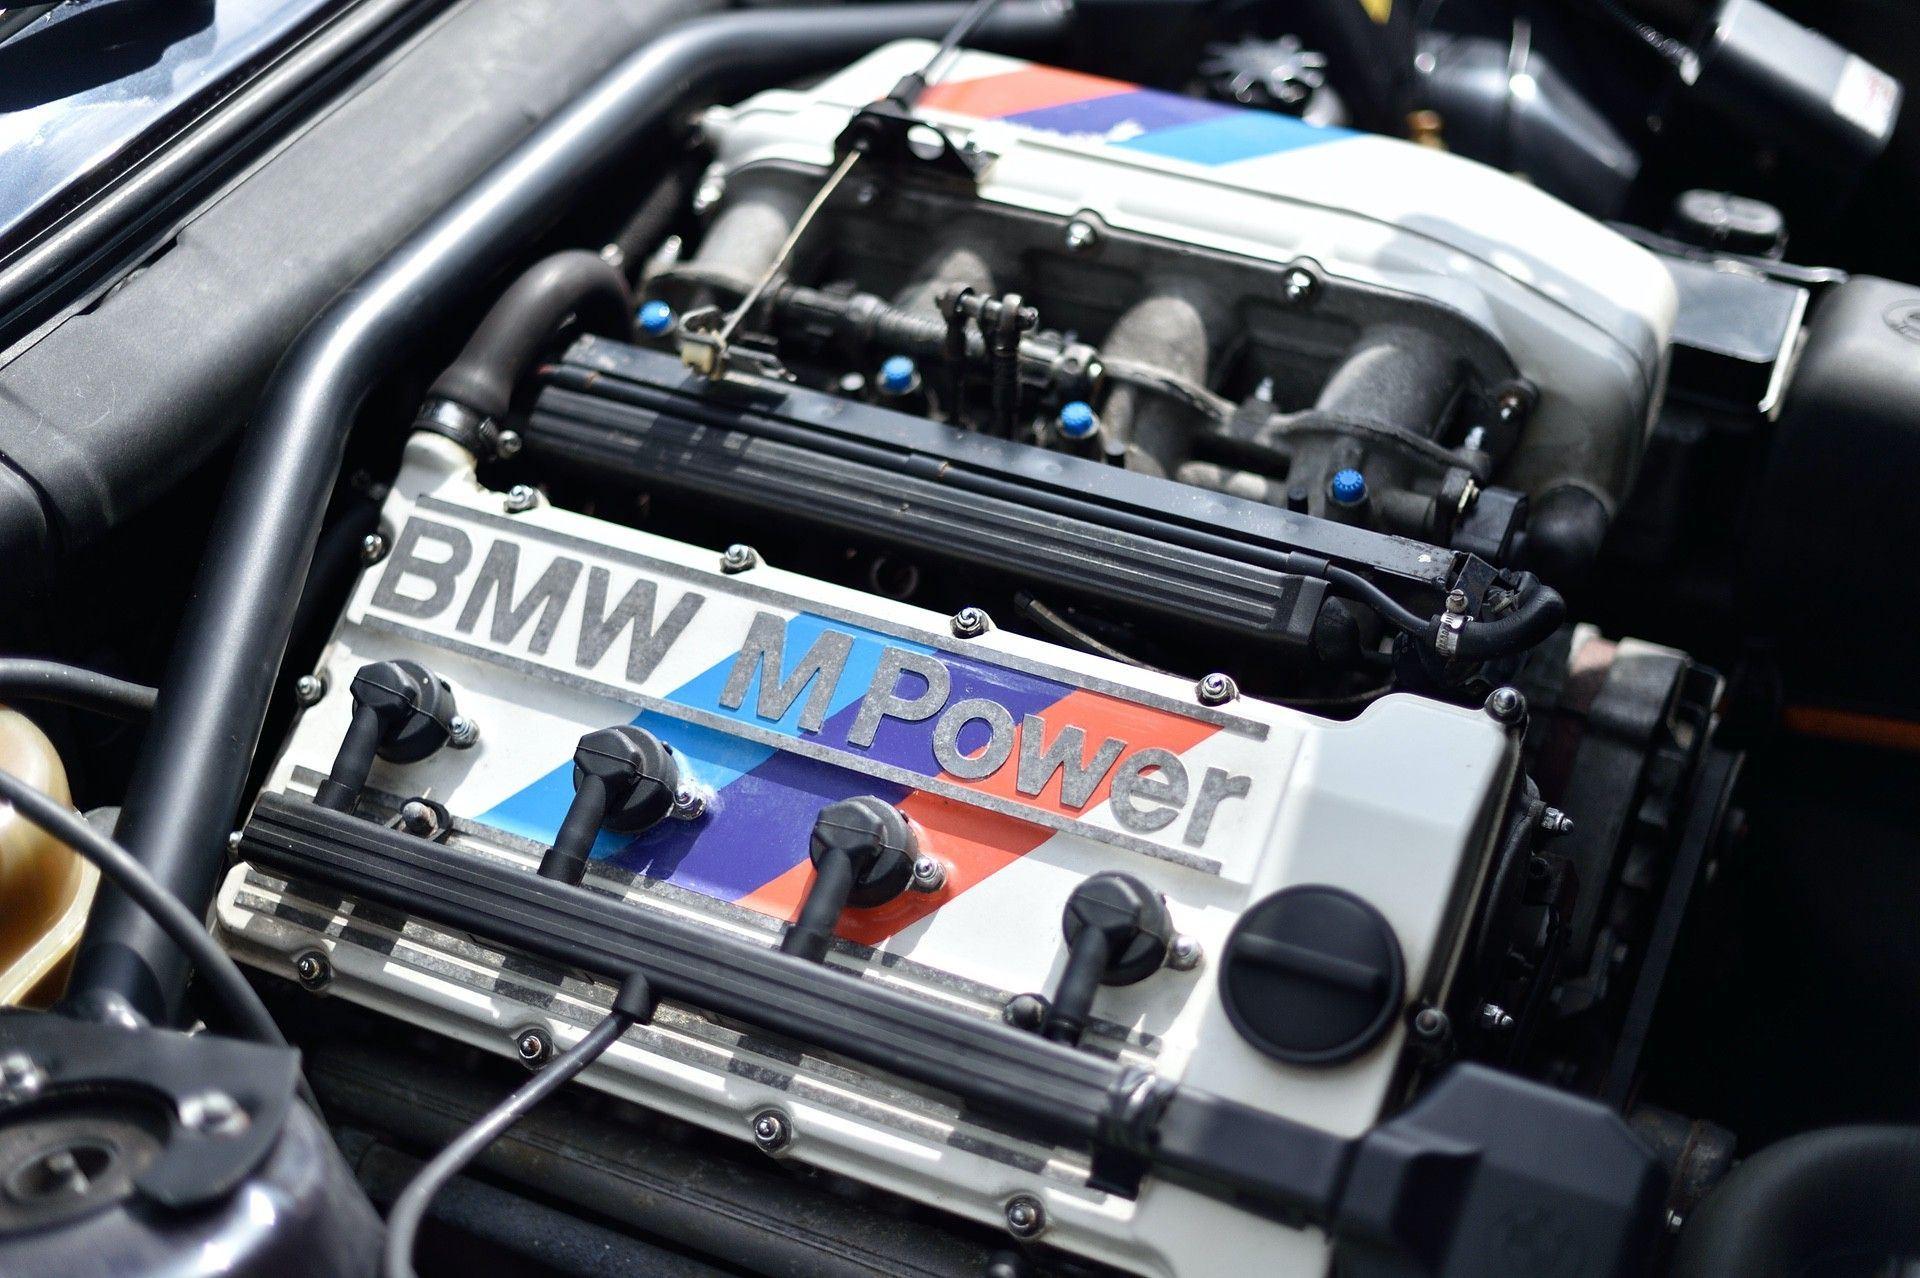 BMW_M3_Evo_II_sale_0118